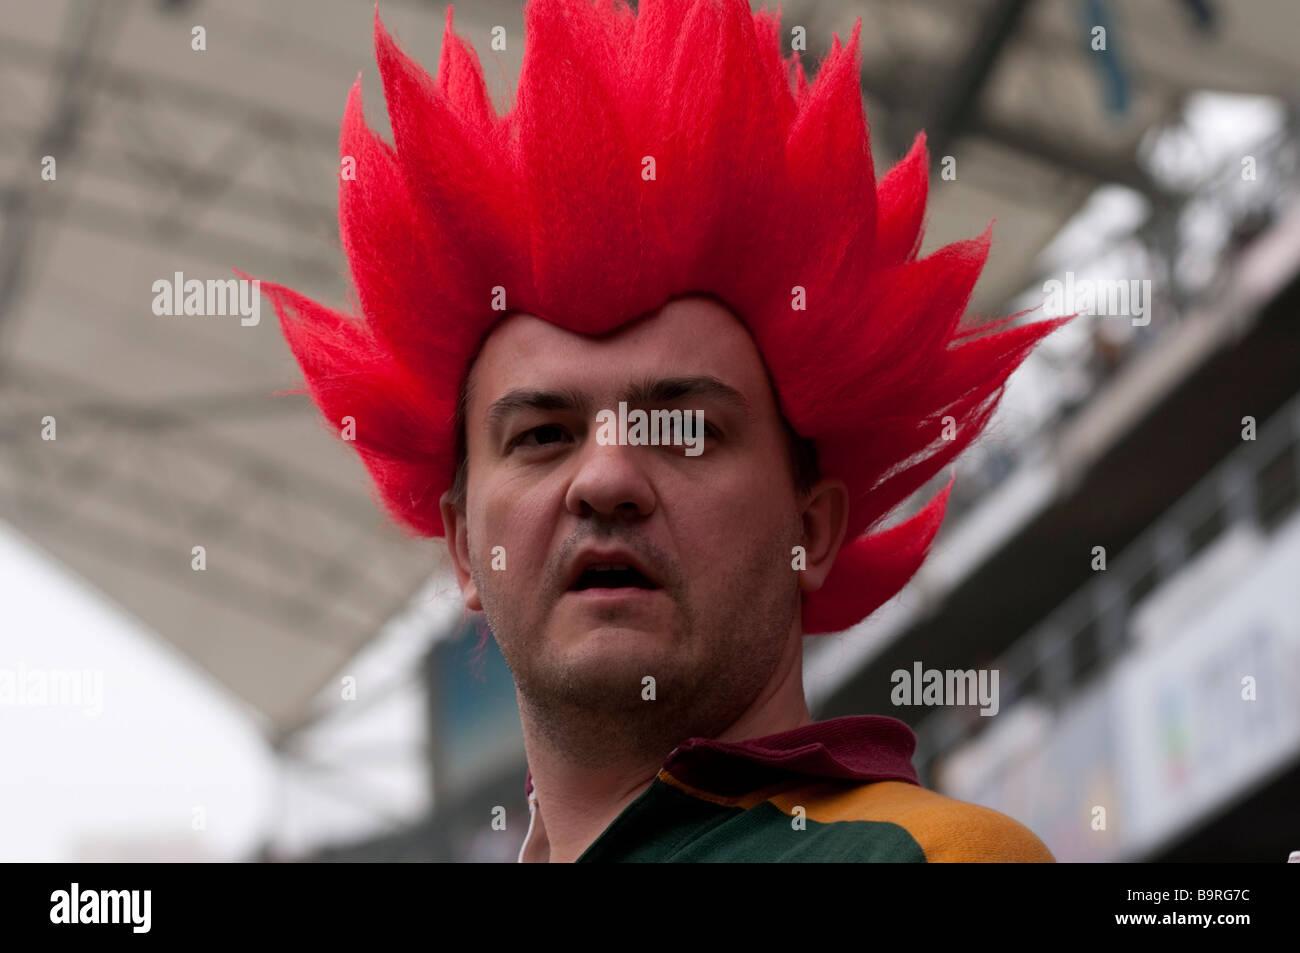 A Reveller at The Hong Kong Rugby Sevens - Stock Image